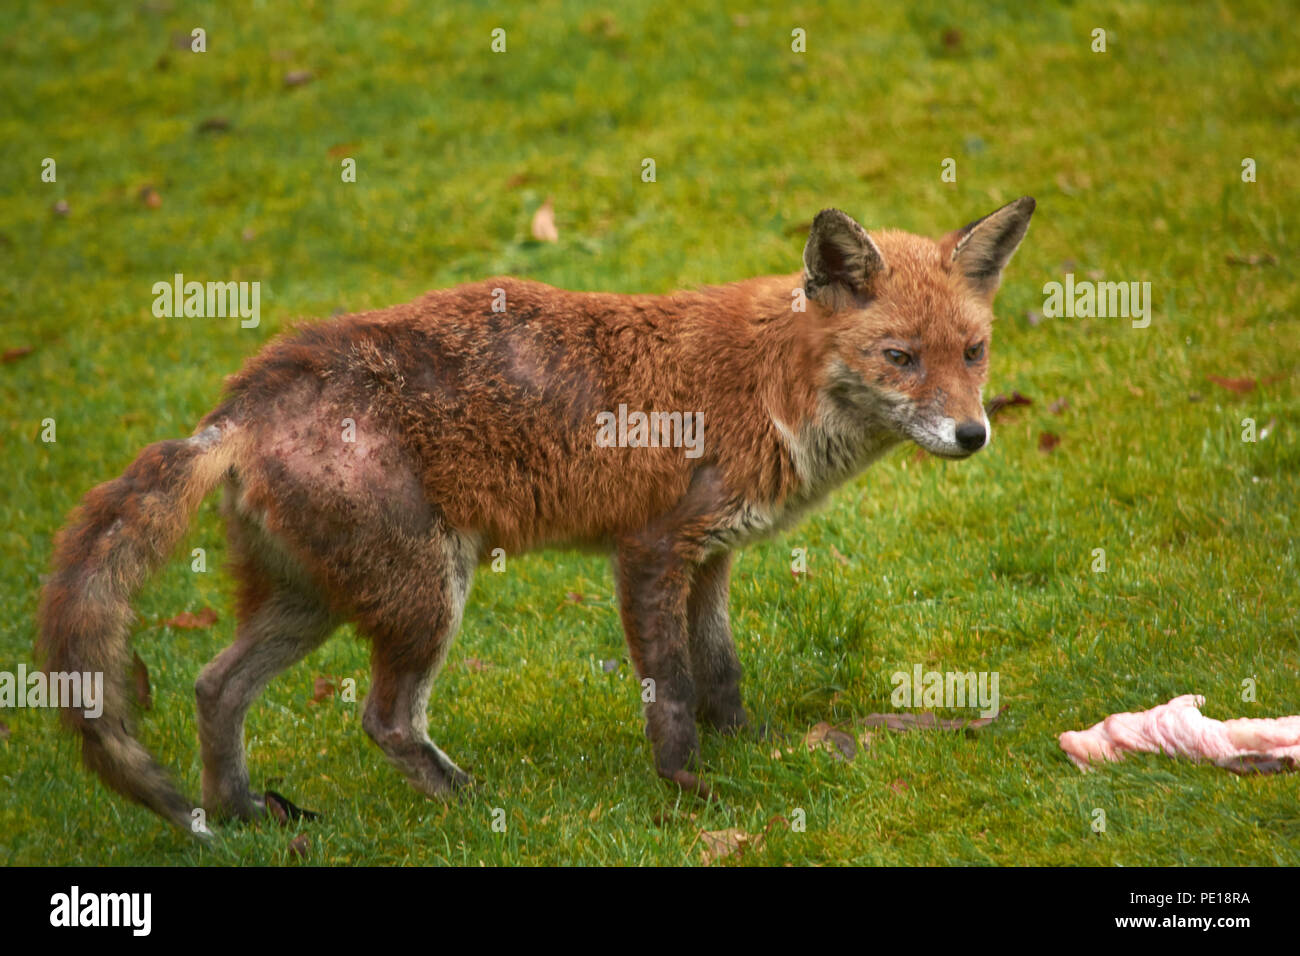 Urban wild fox in back garden, fox, sick animal, wild animal, fox with skin problem,, hungry fox - Stock Image